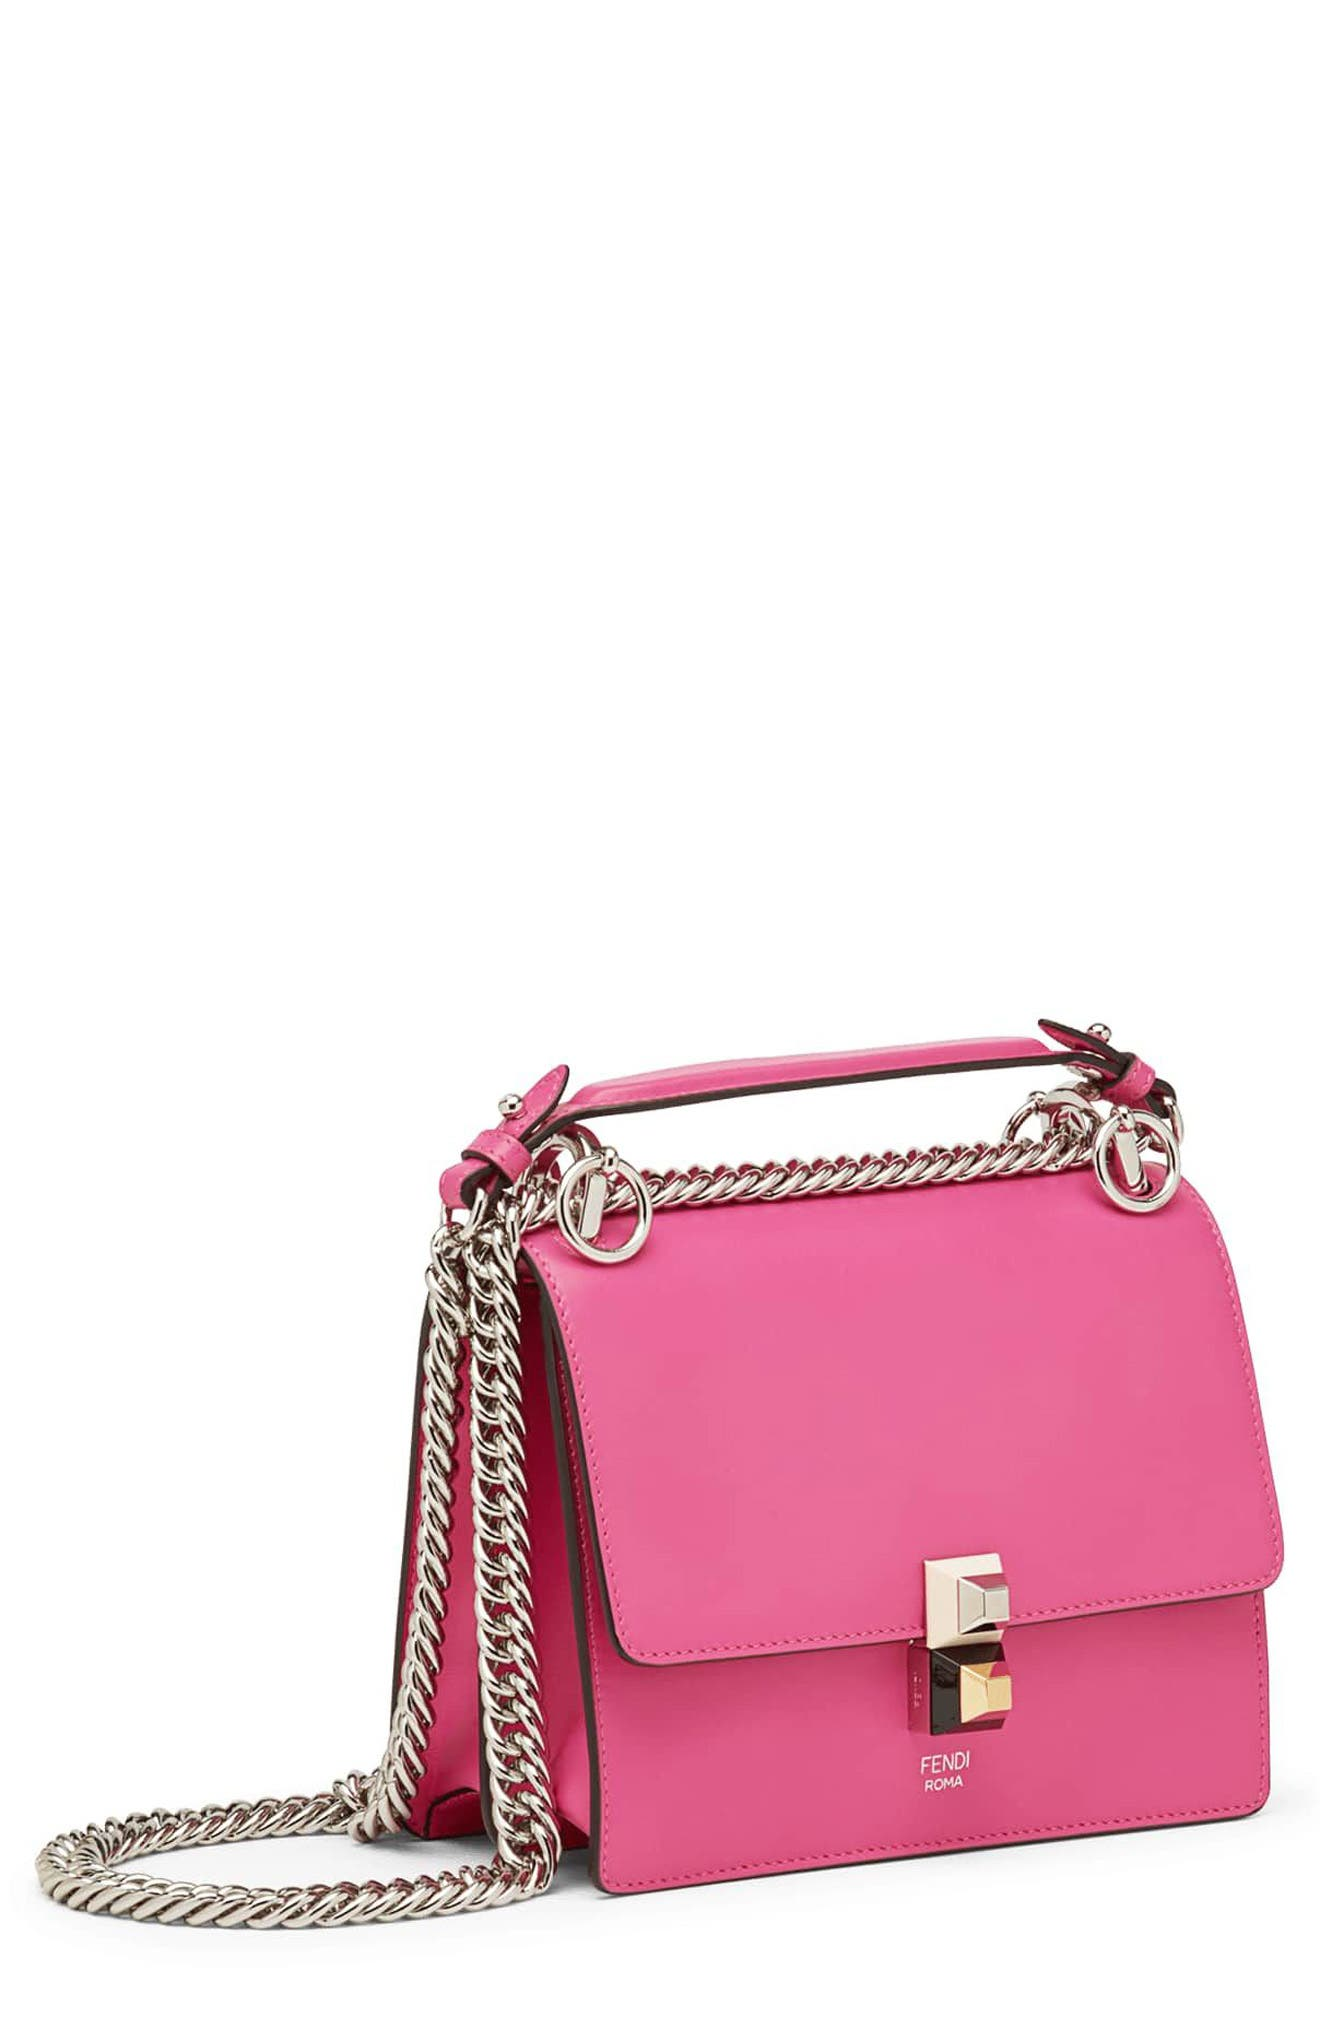 Small Kan I Leather Shoulder Bag,                             Main thumbnail 1, color,                             GERANIUM